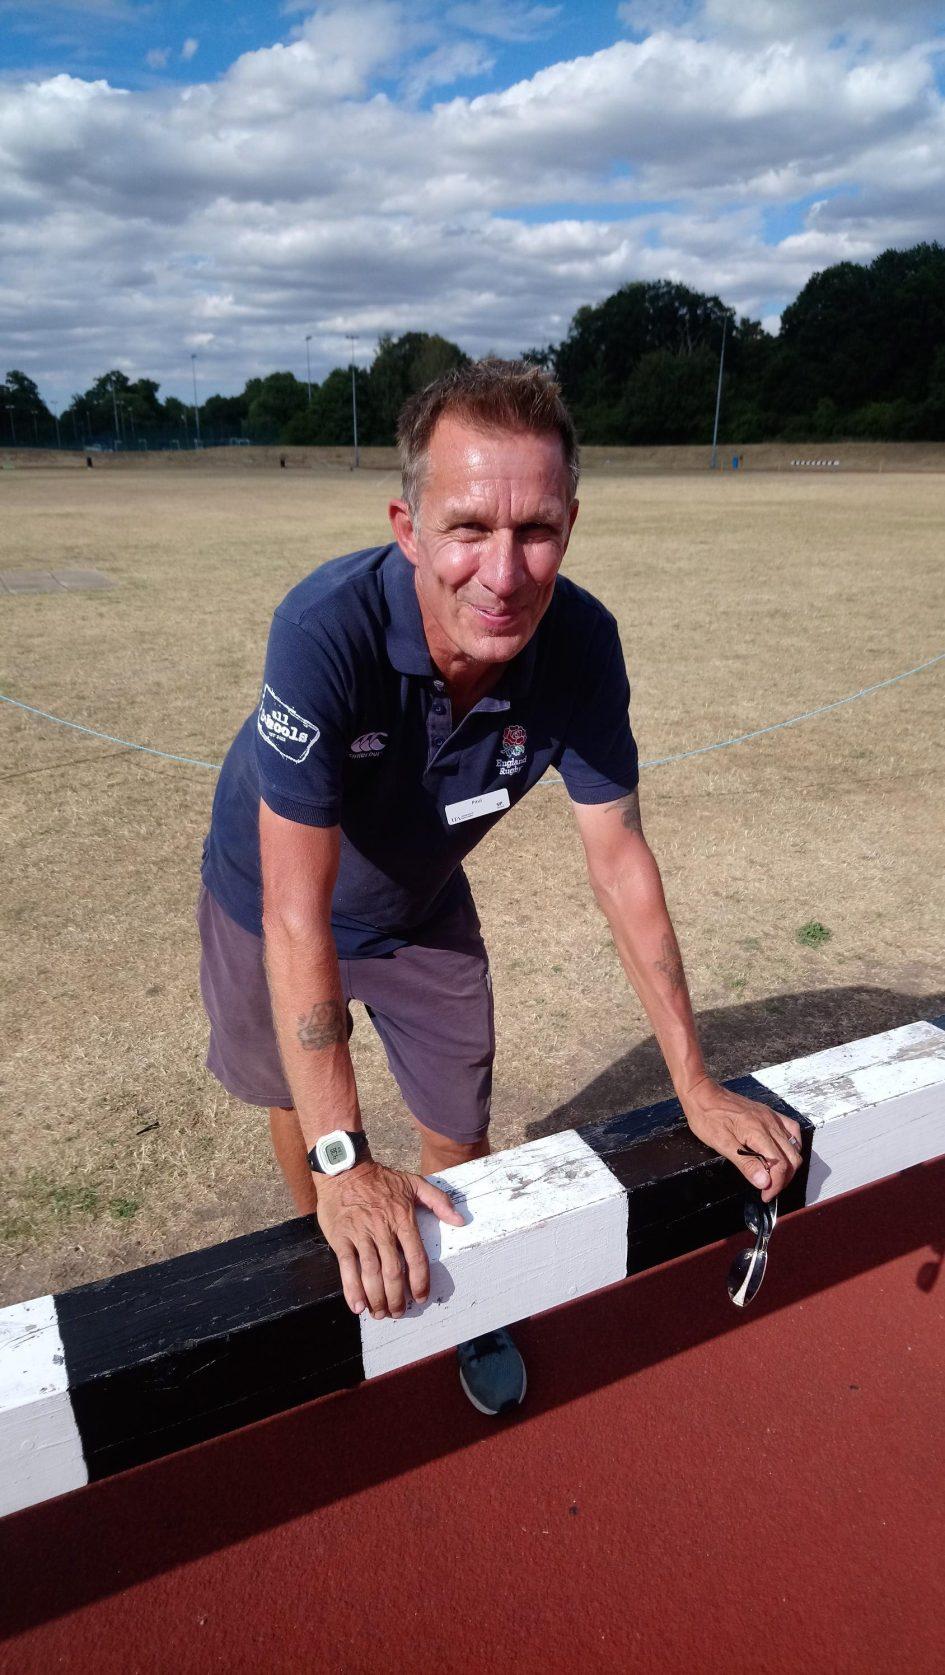 Running coach Paul Evans says a run-walk strategy is his plan for Run Norwich 2018